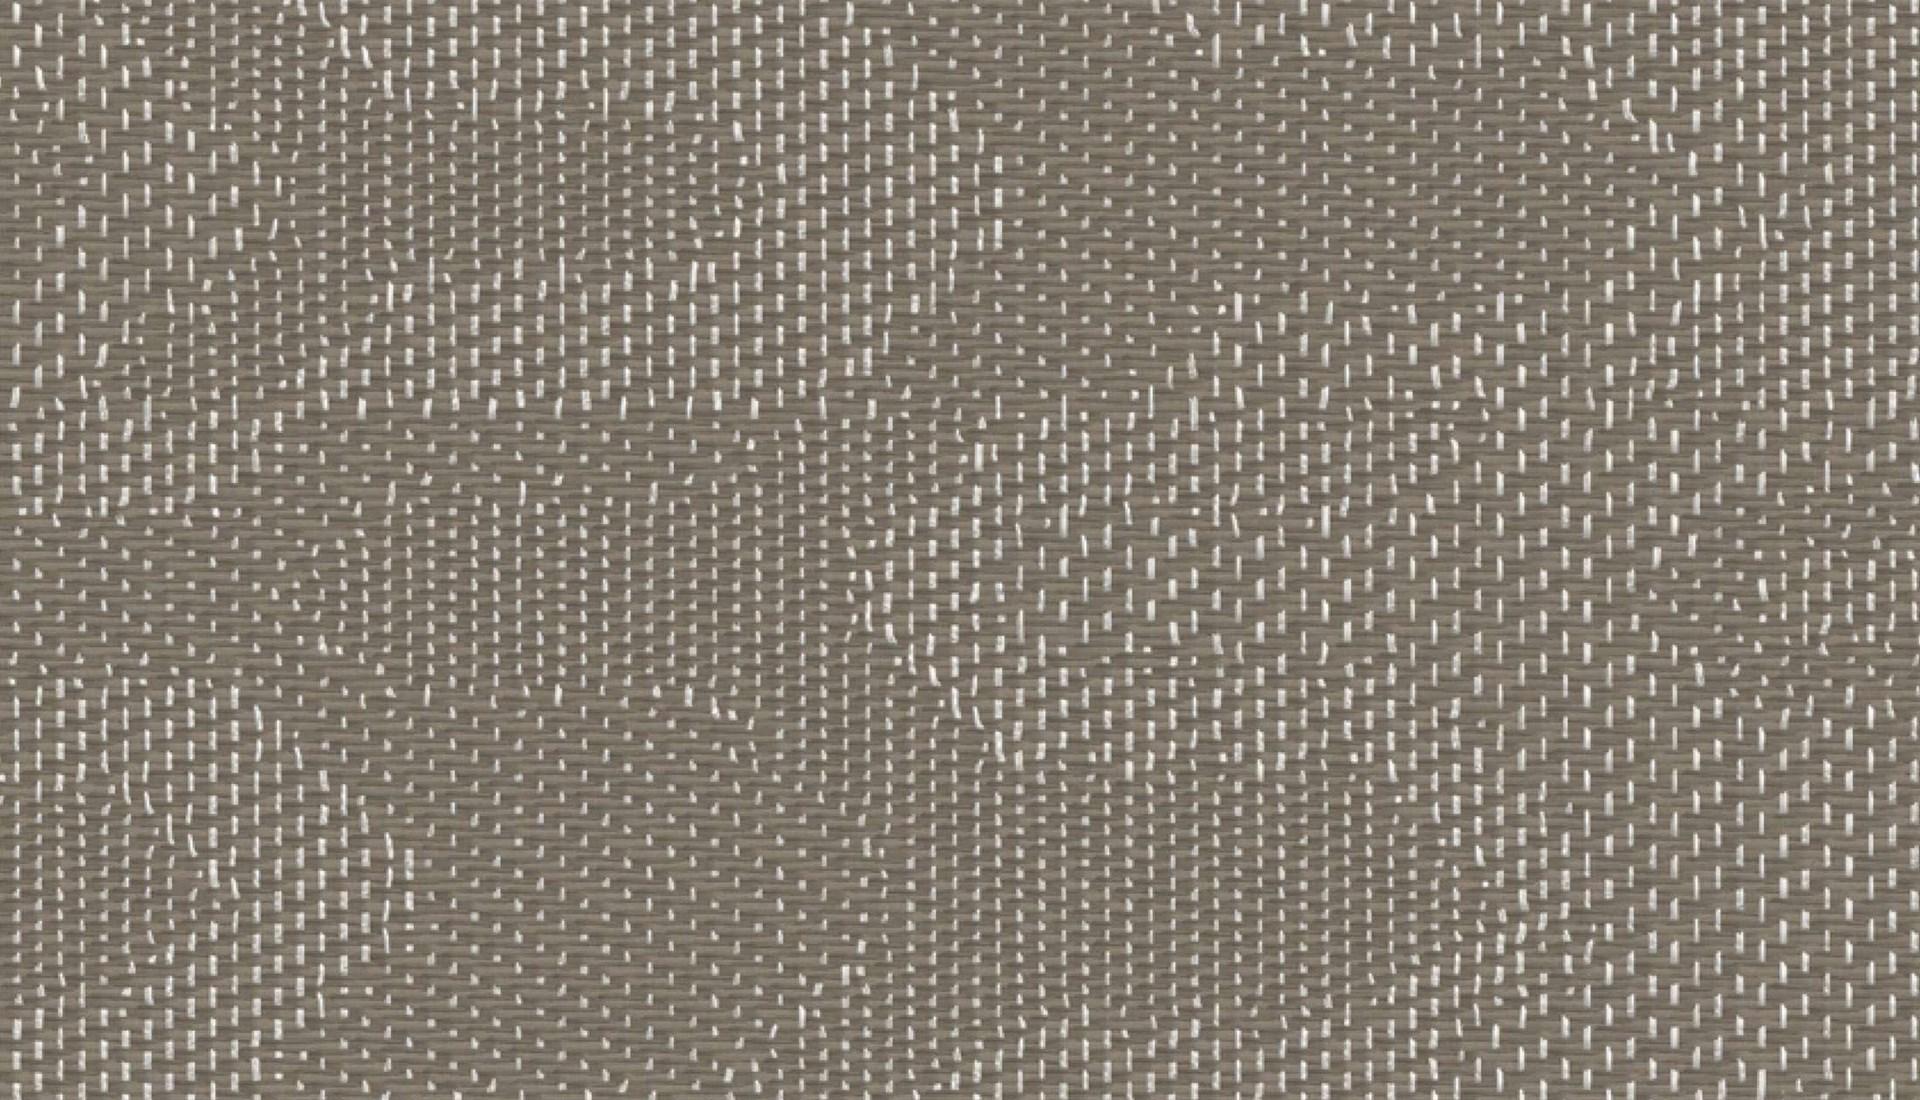 Bolonbymissoniopticalstone2 2x